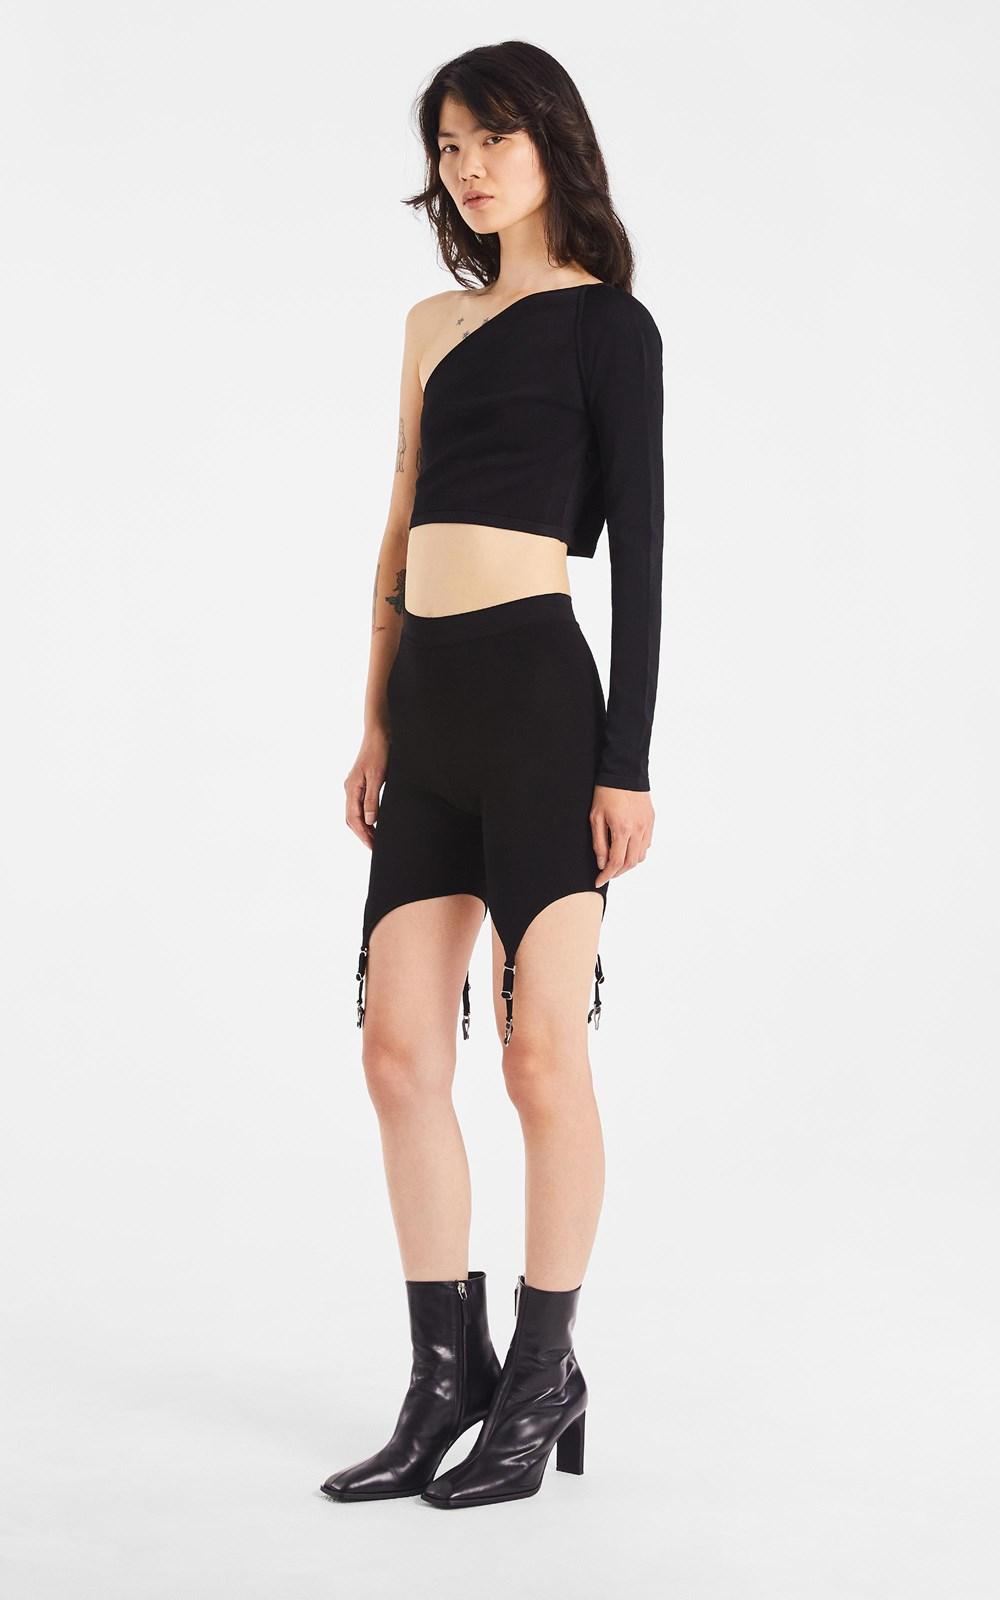 Knitwear | SHADOW INVERSE TOP